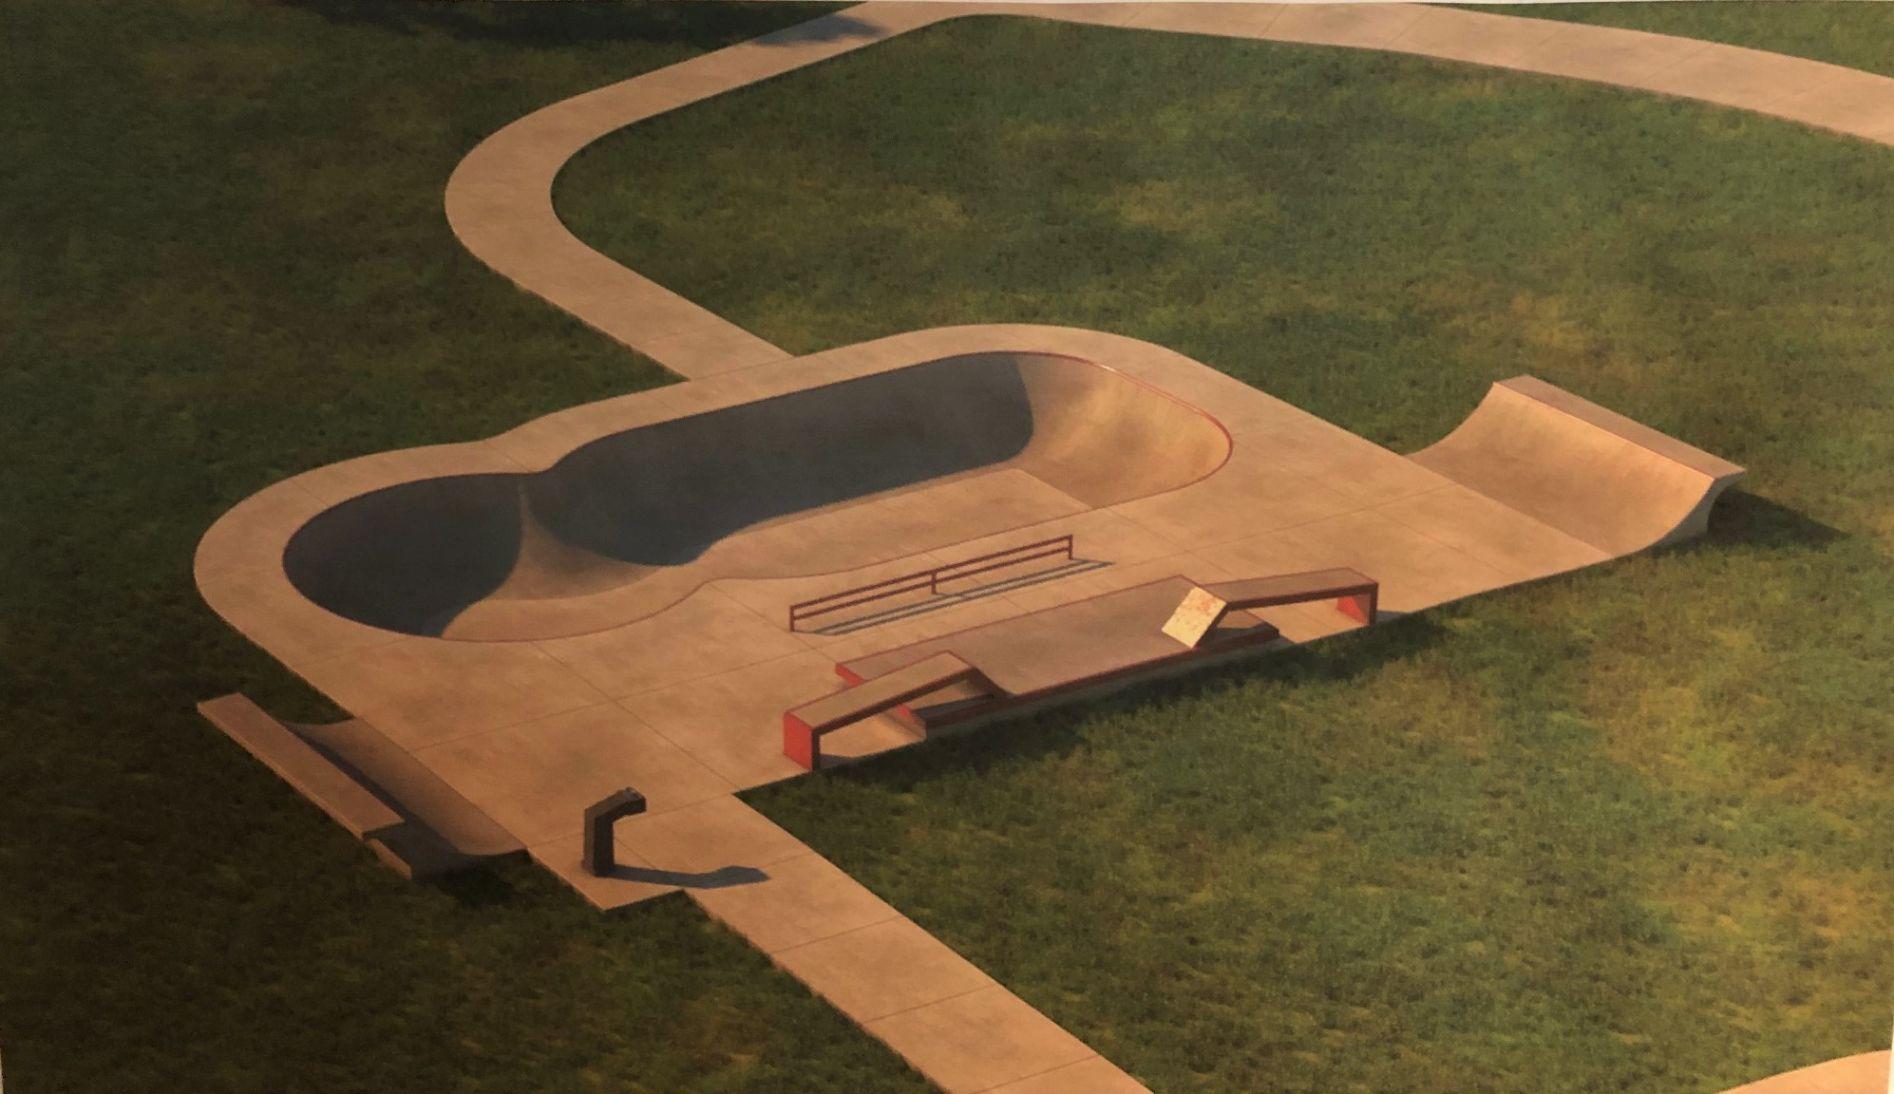 Mansfield City Council plans Tuesday vote on $200K skate park